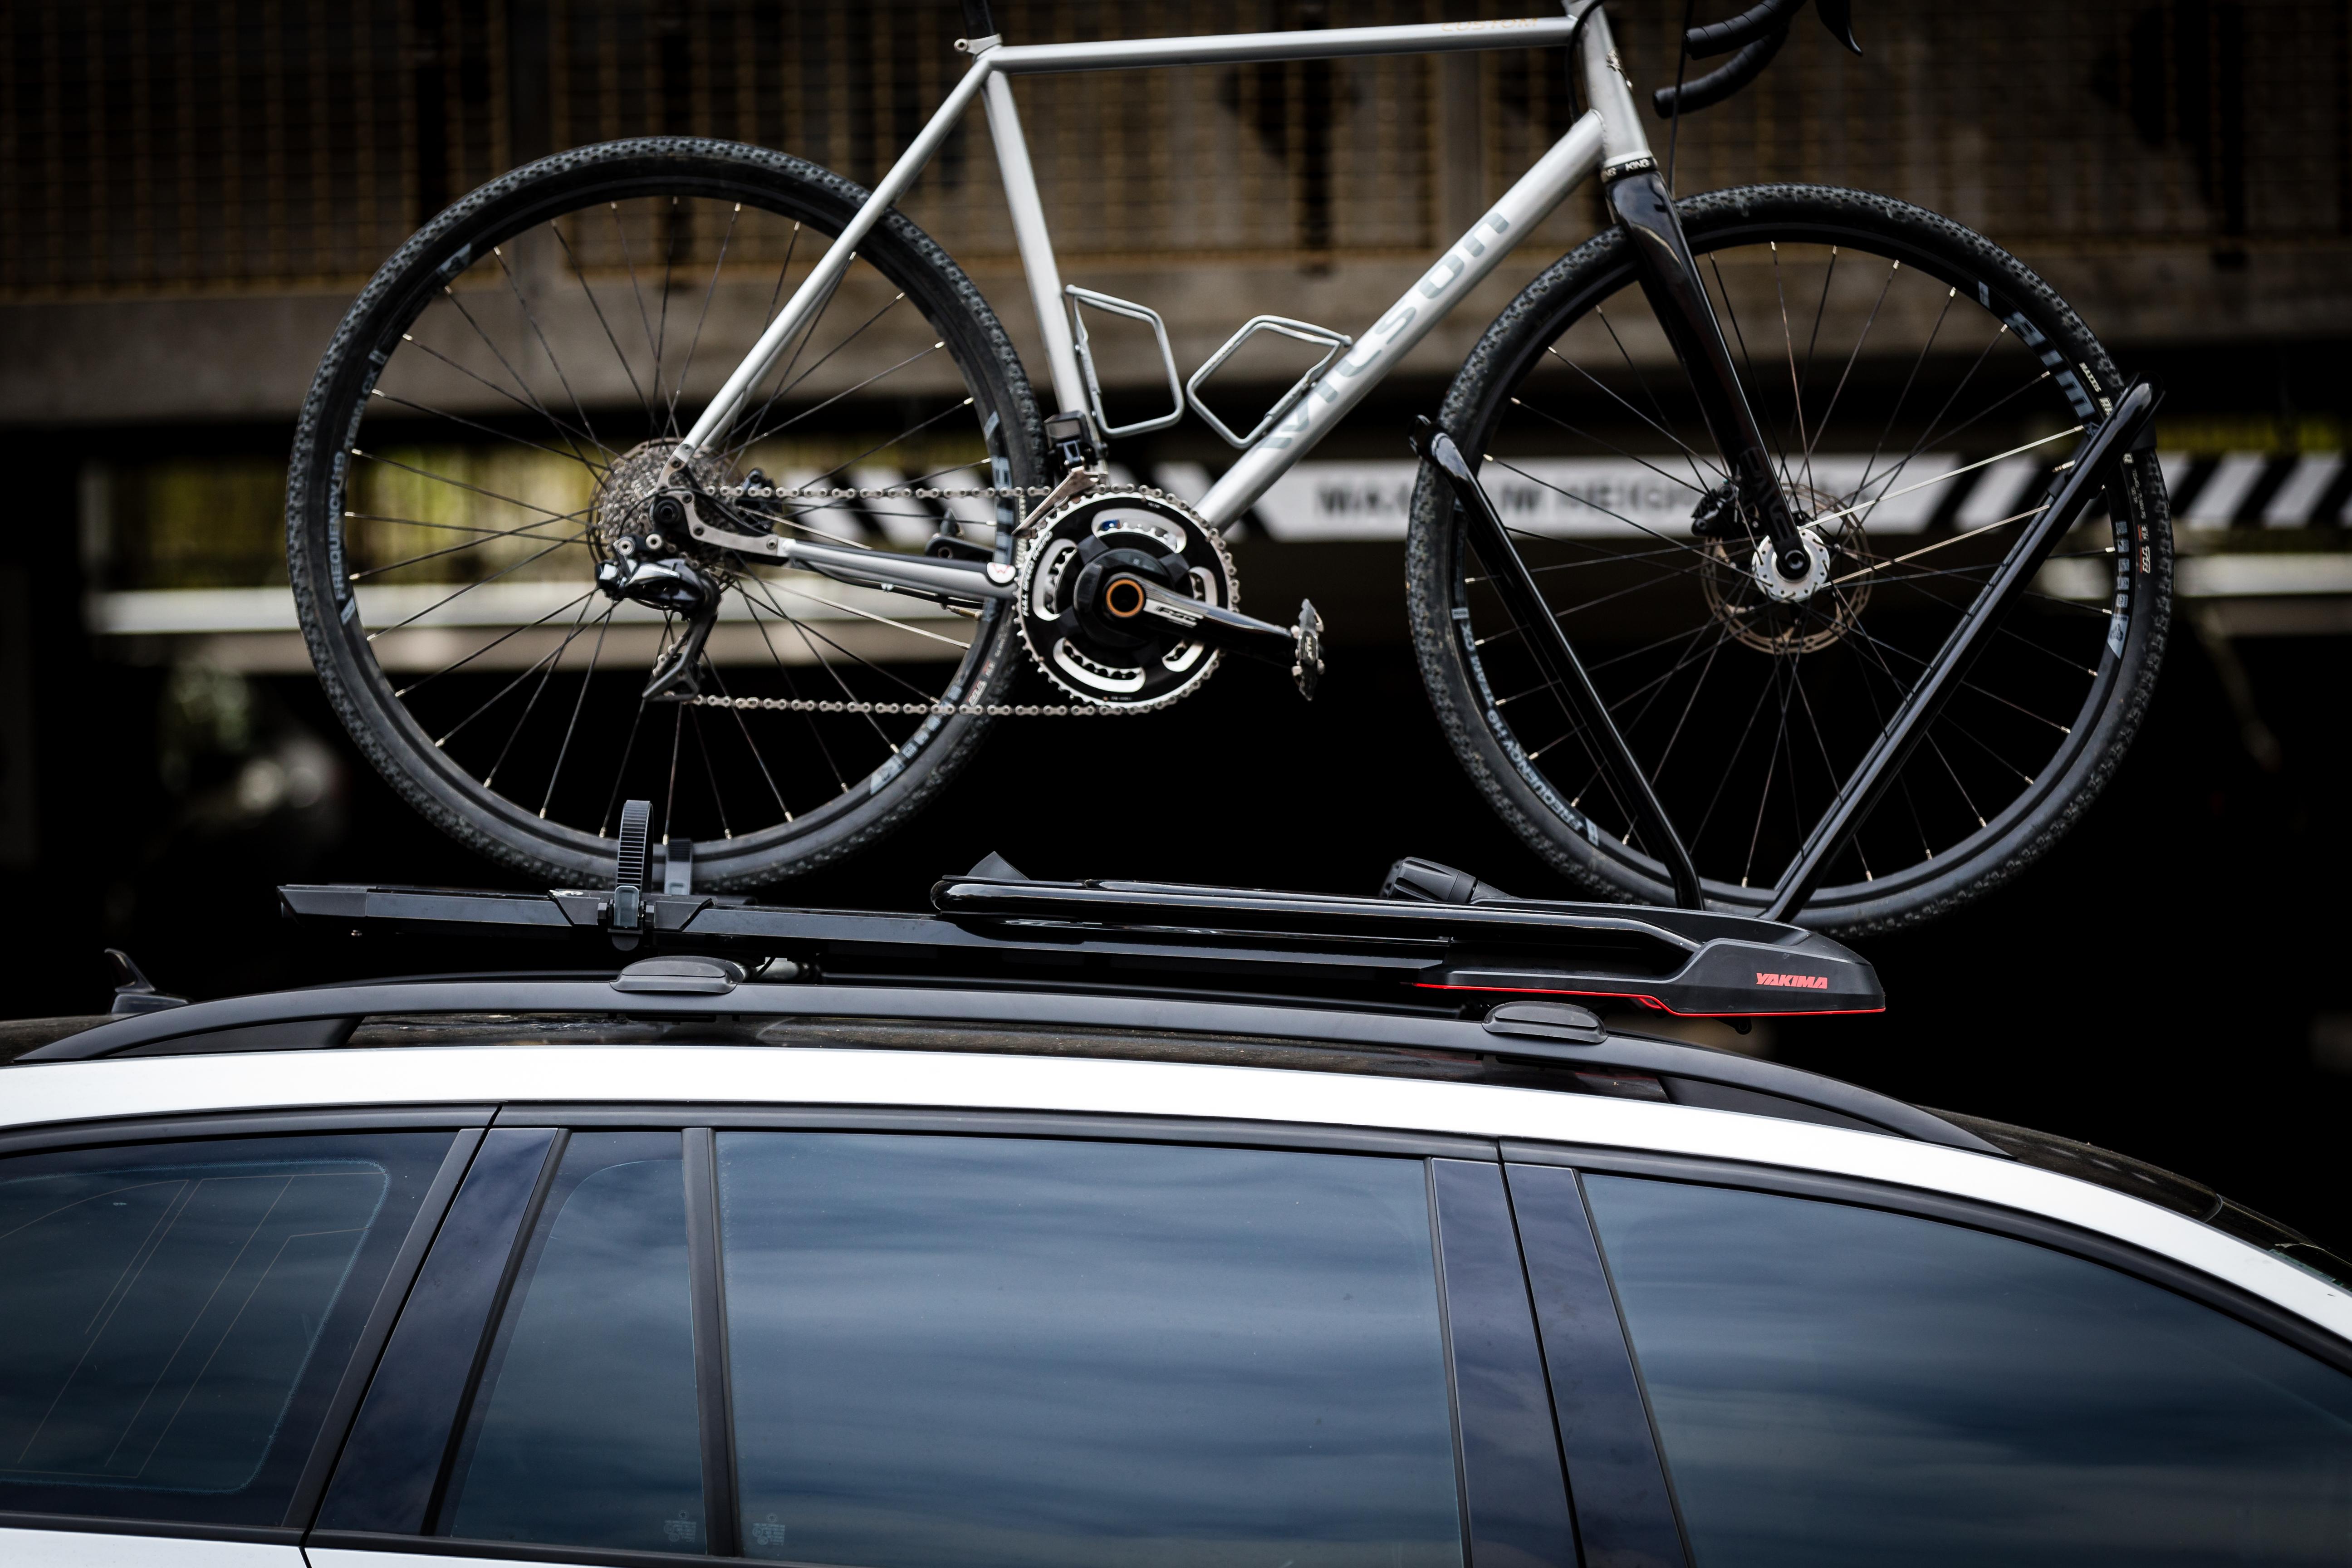 Yakima HighRoad Bike Rack